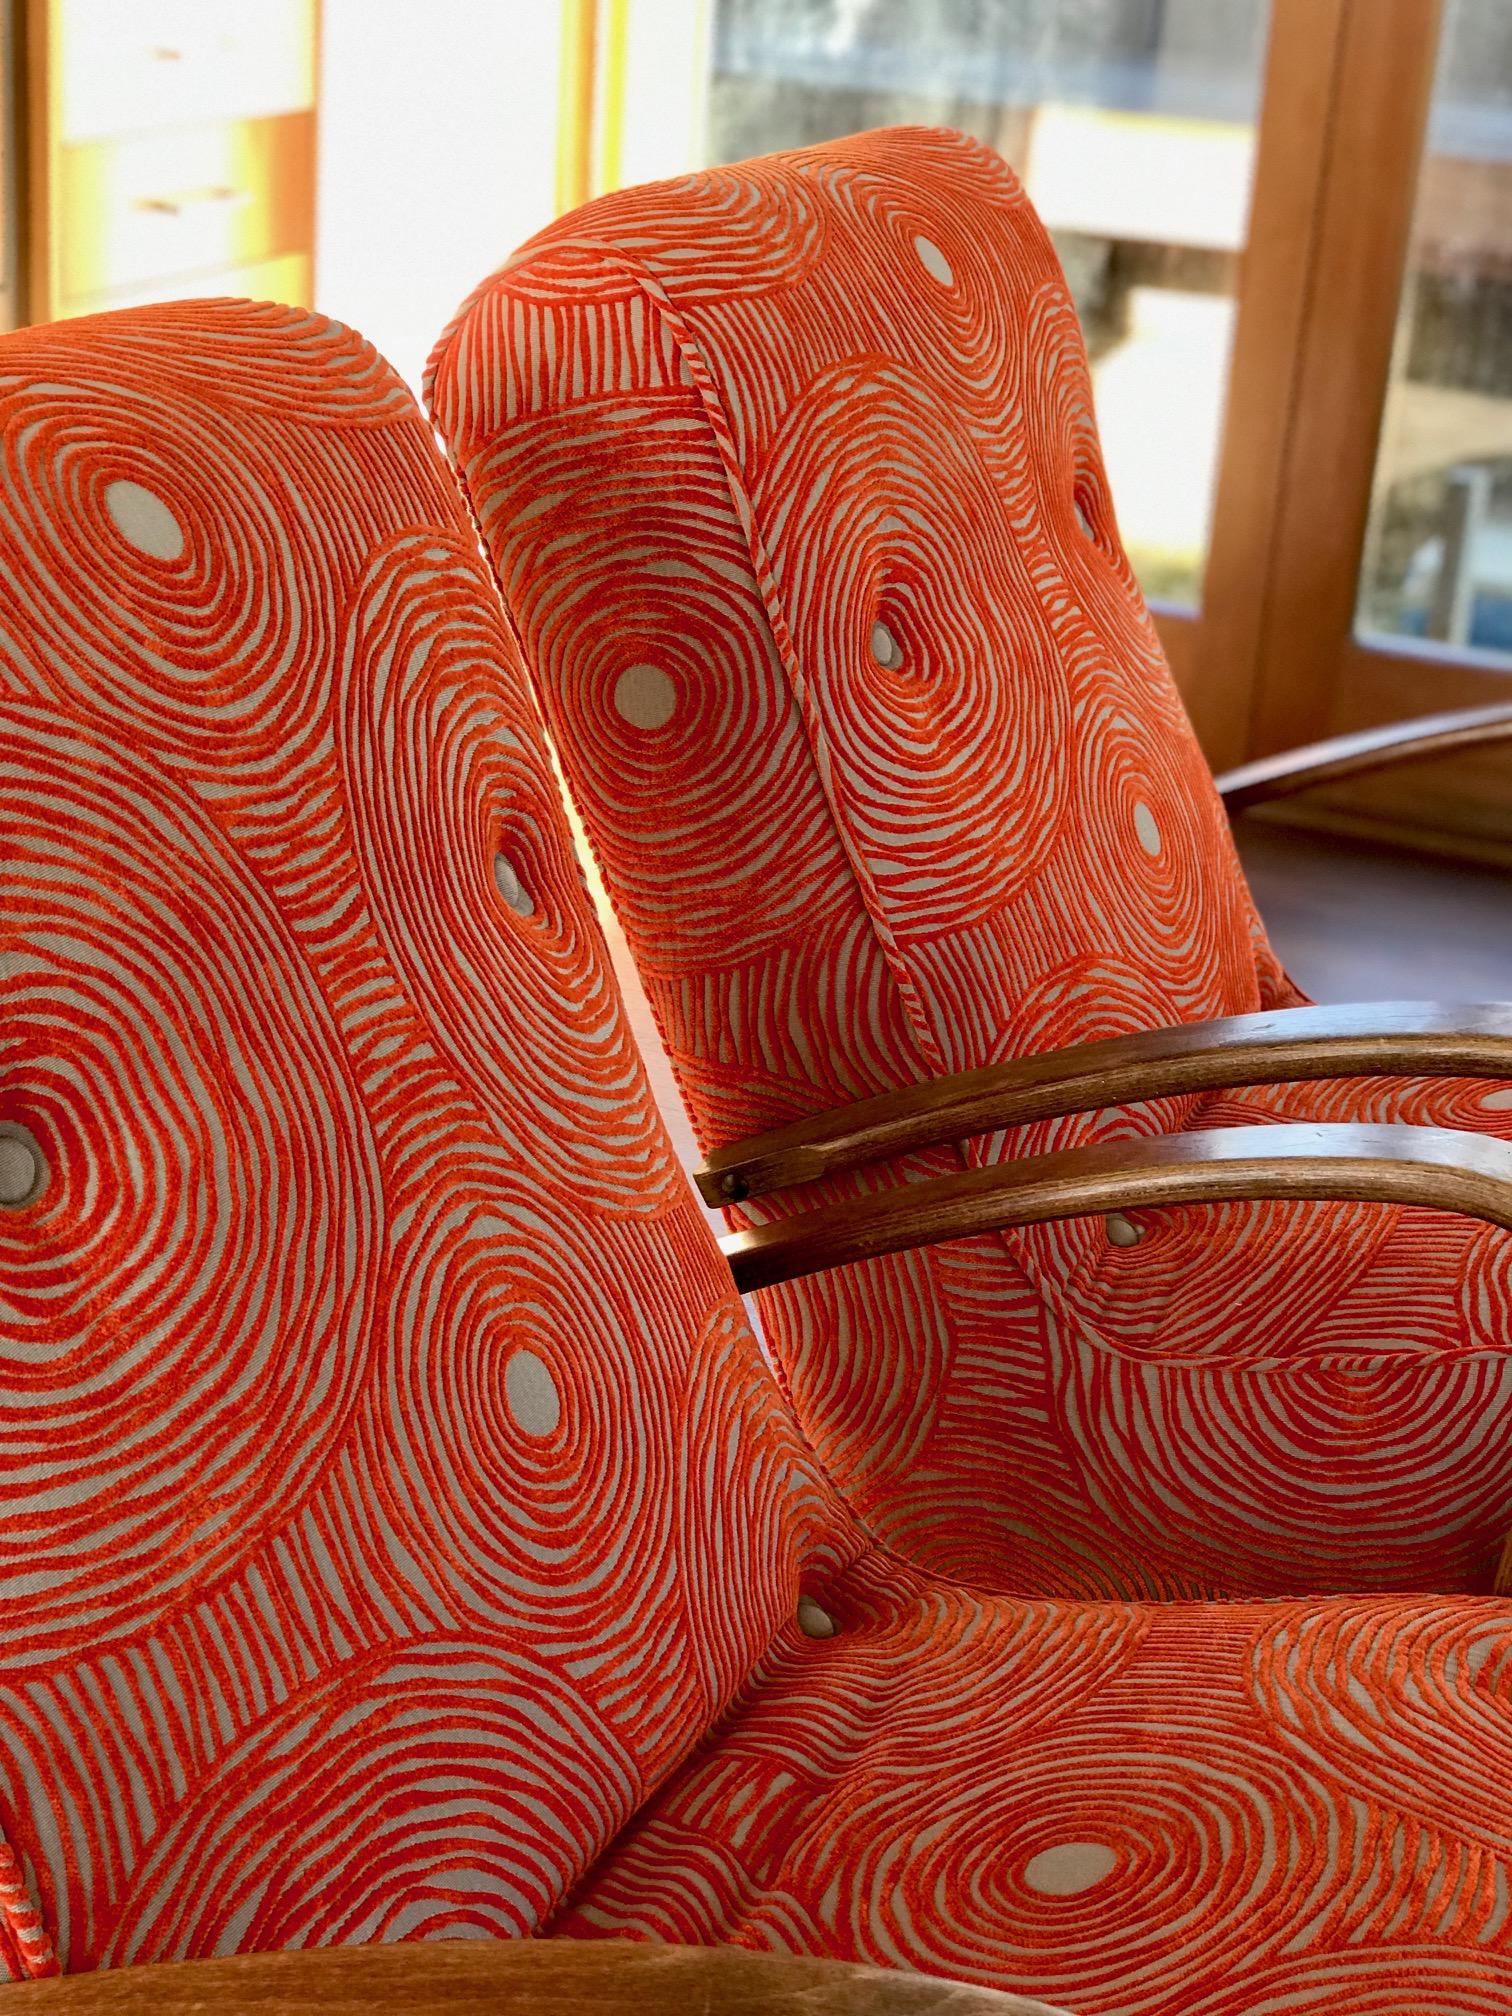 Retro Chairs - Orange